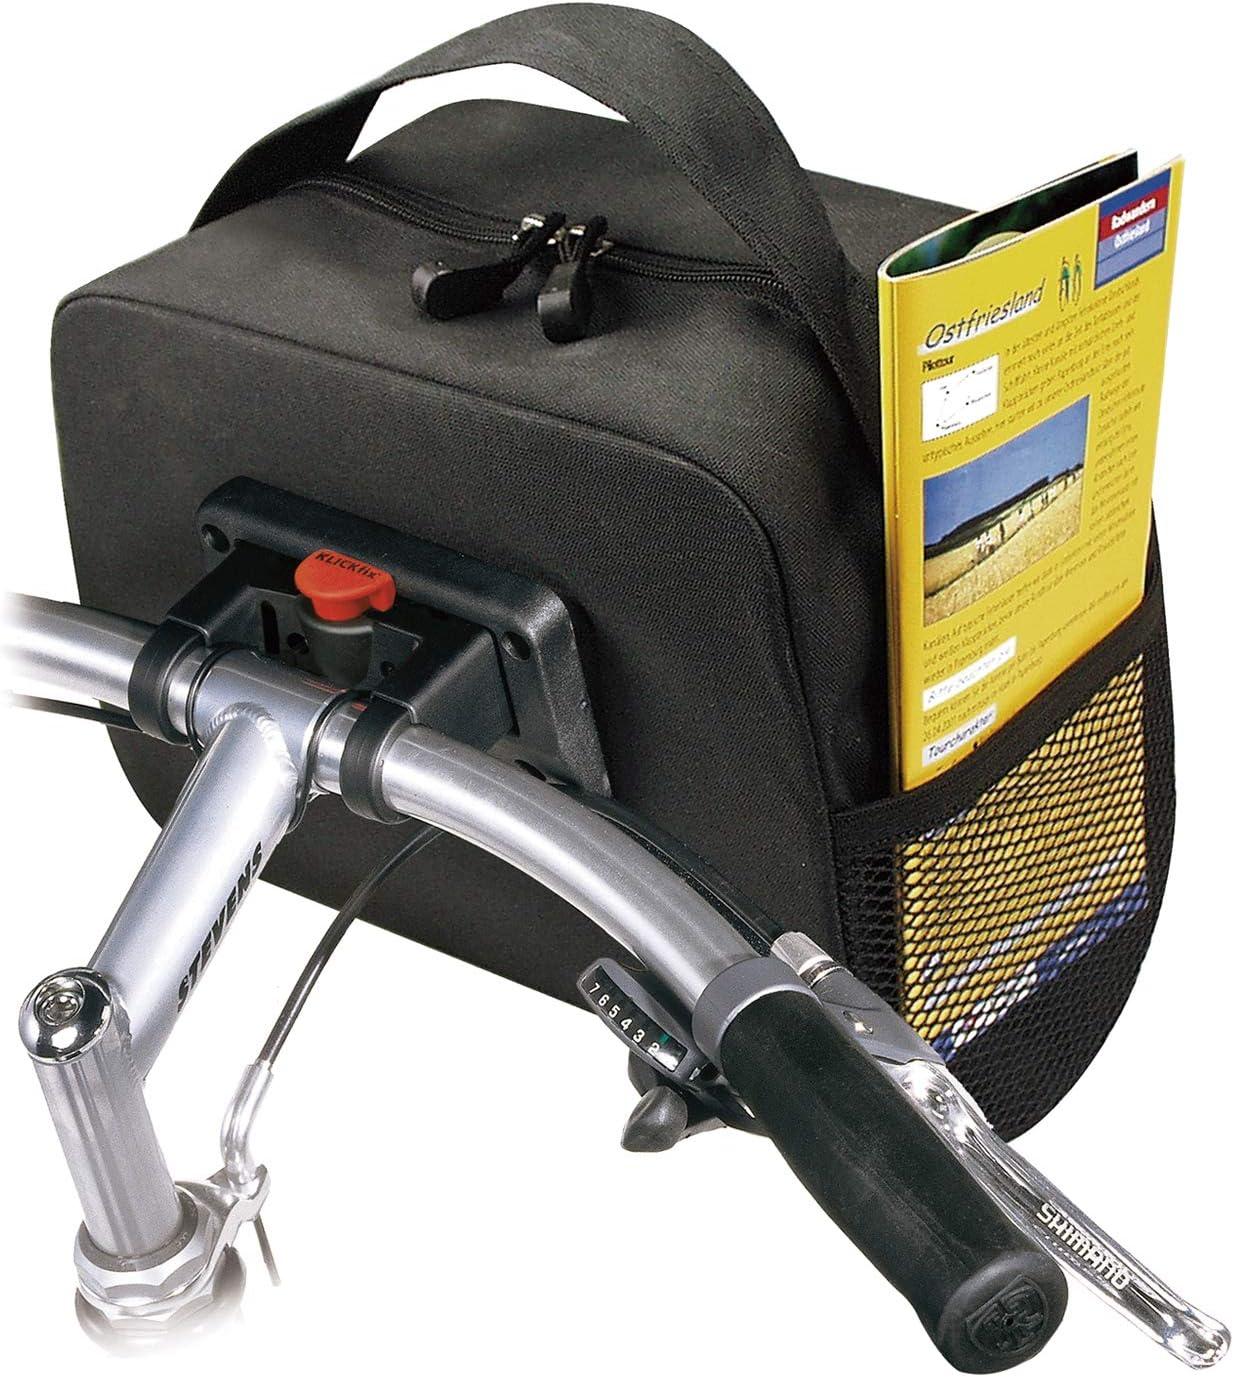 Fahrrad Lenkertasche Rixen und Kaul KlickFix Baggy Plus